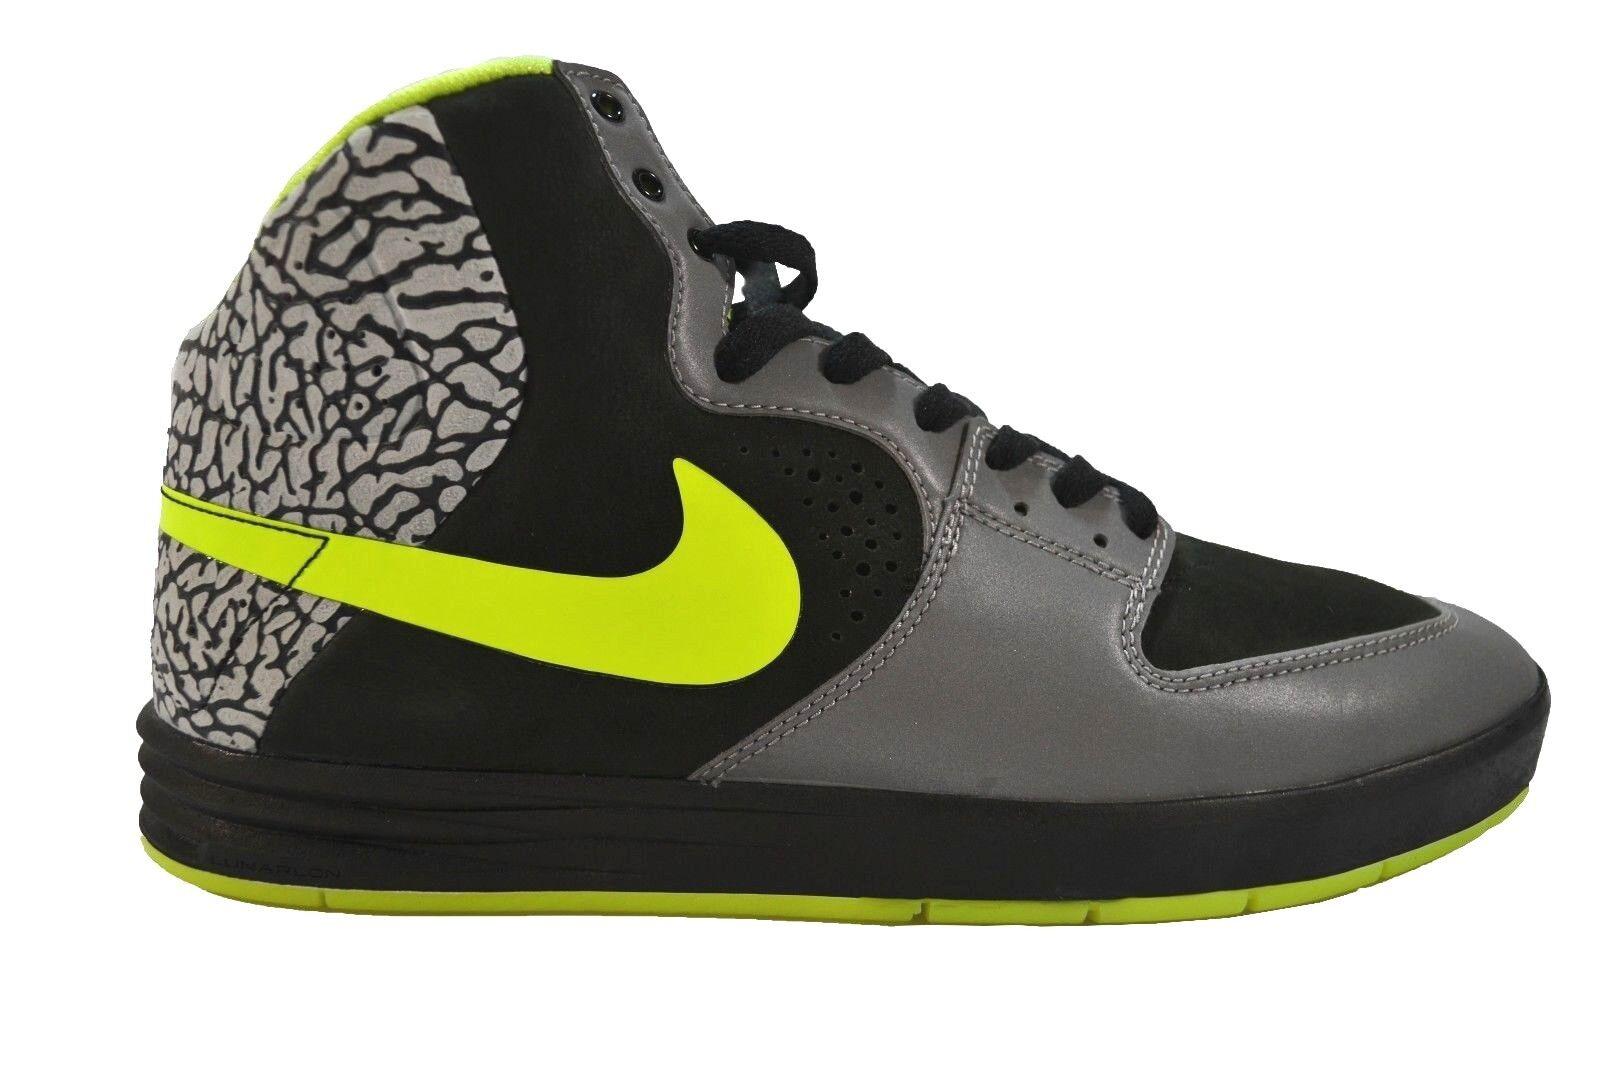 Nike PAUL RODRIGUEZ 7 HIGH PRM Metallic Silver Volt Black Price reduction Men's Shoes The latest discount shoes for men and women